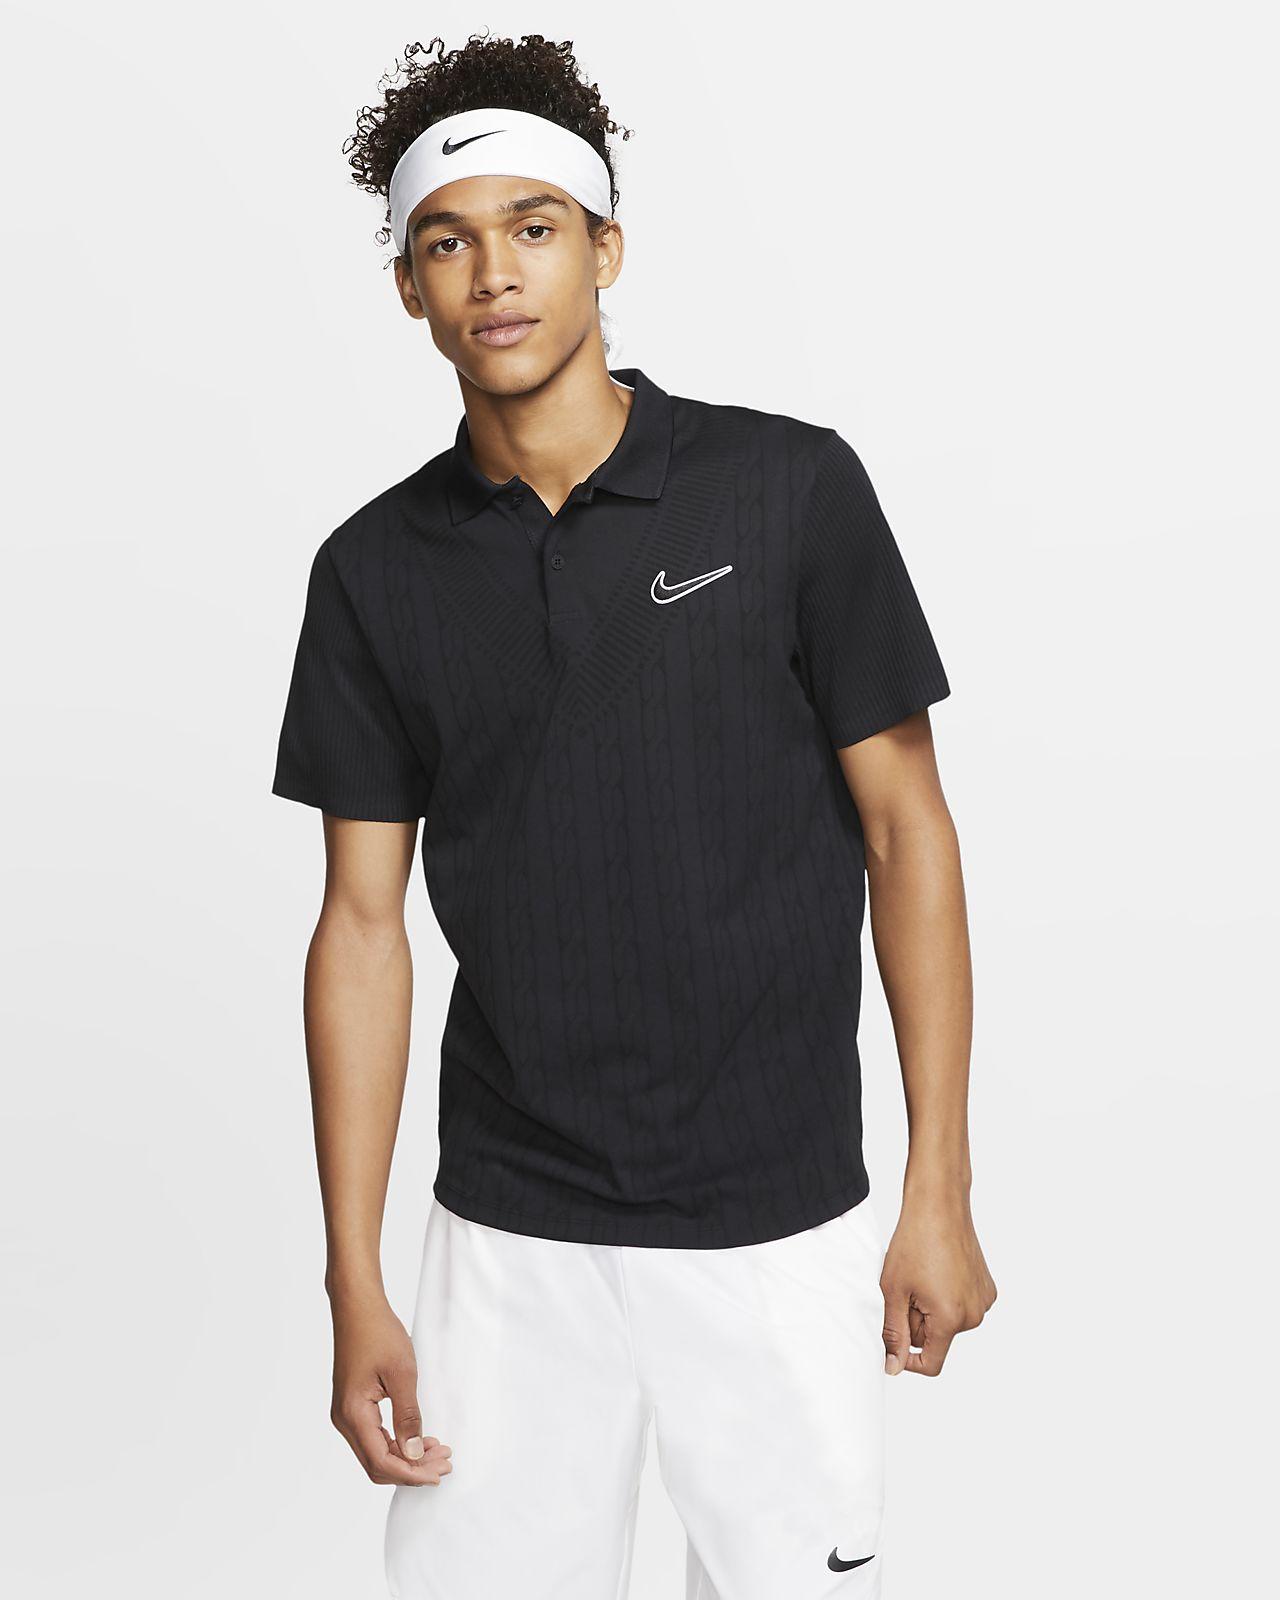 NikeCourt Advantage-tennistrøye for herre